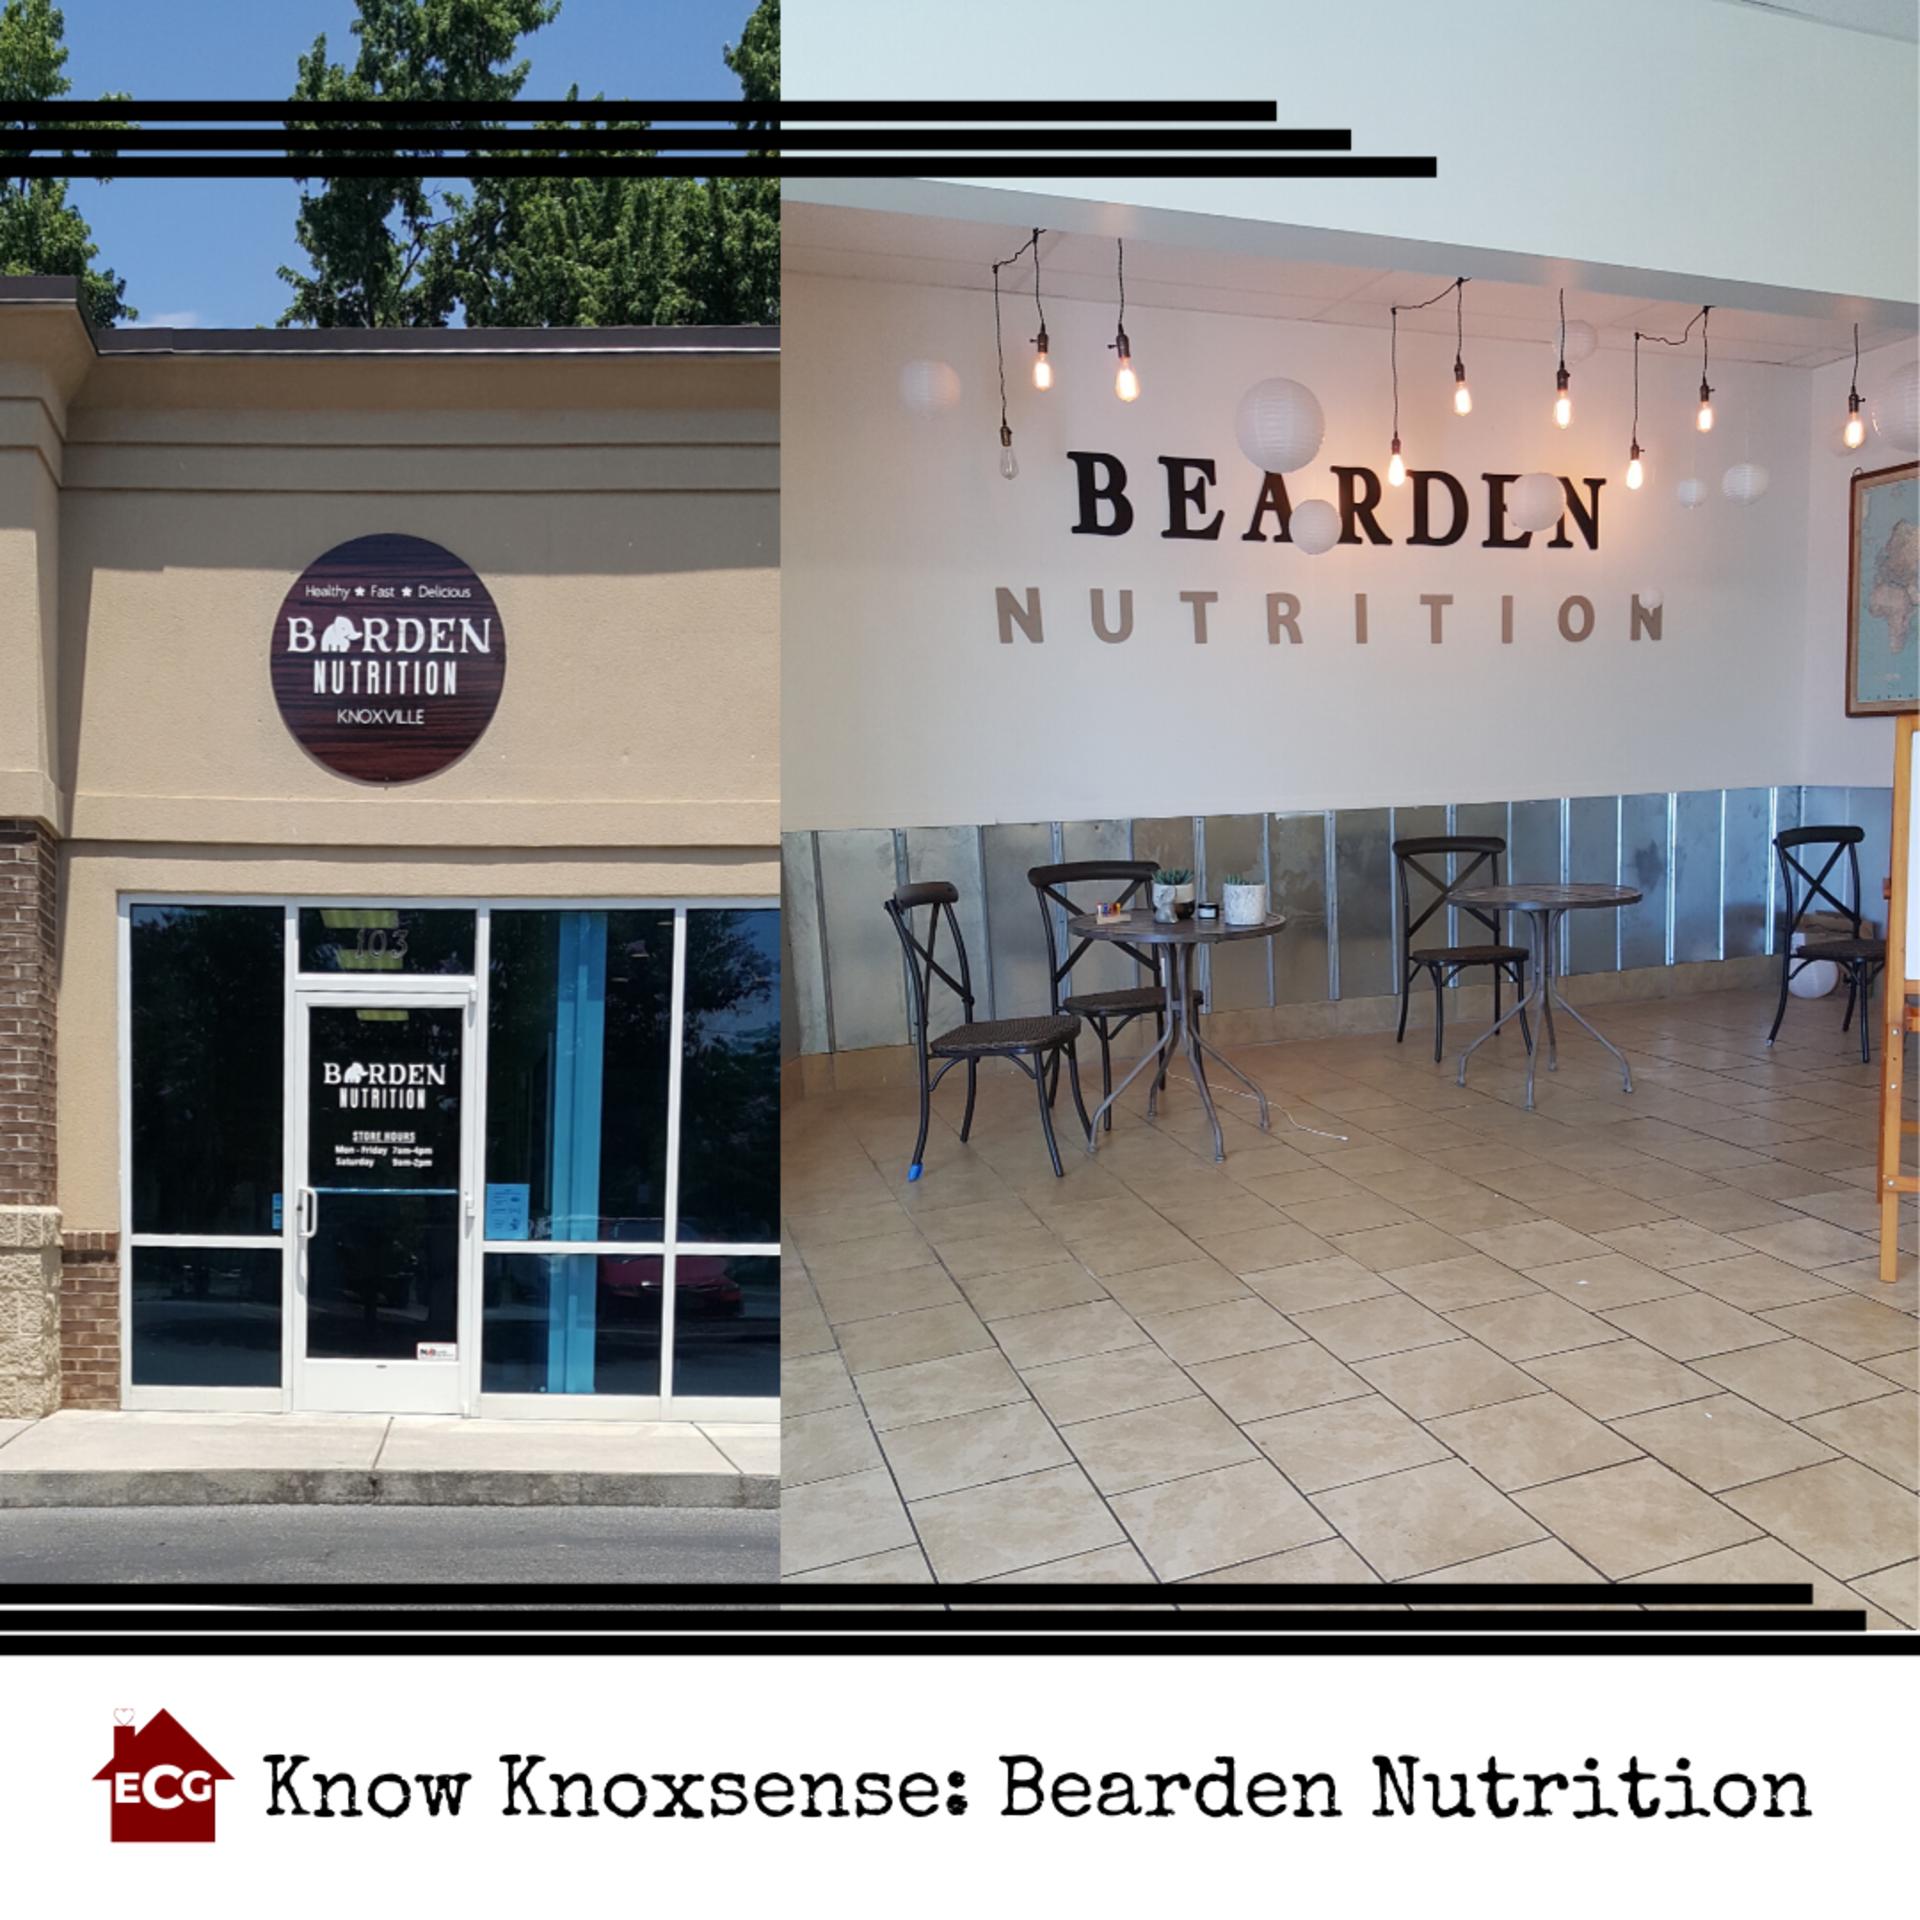 Know Knoxsense: Bearden Nutrition